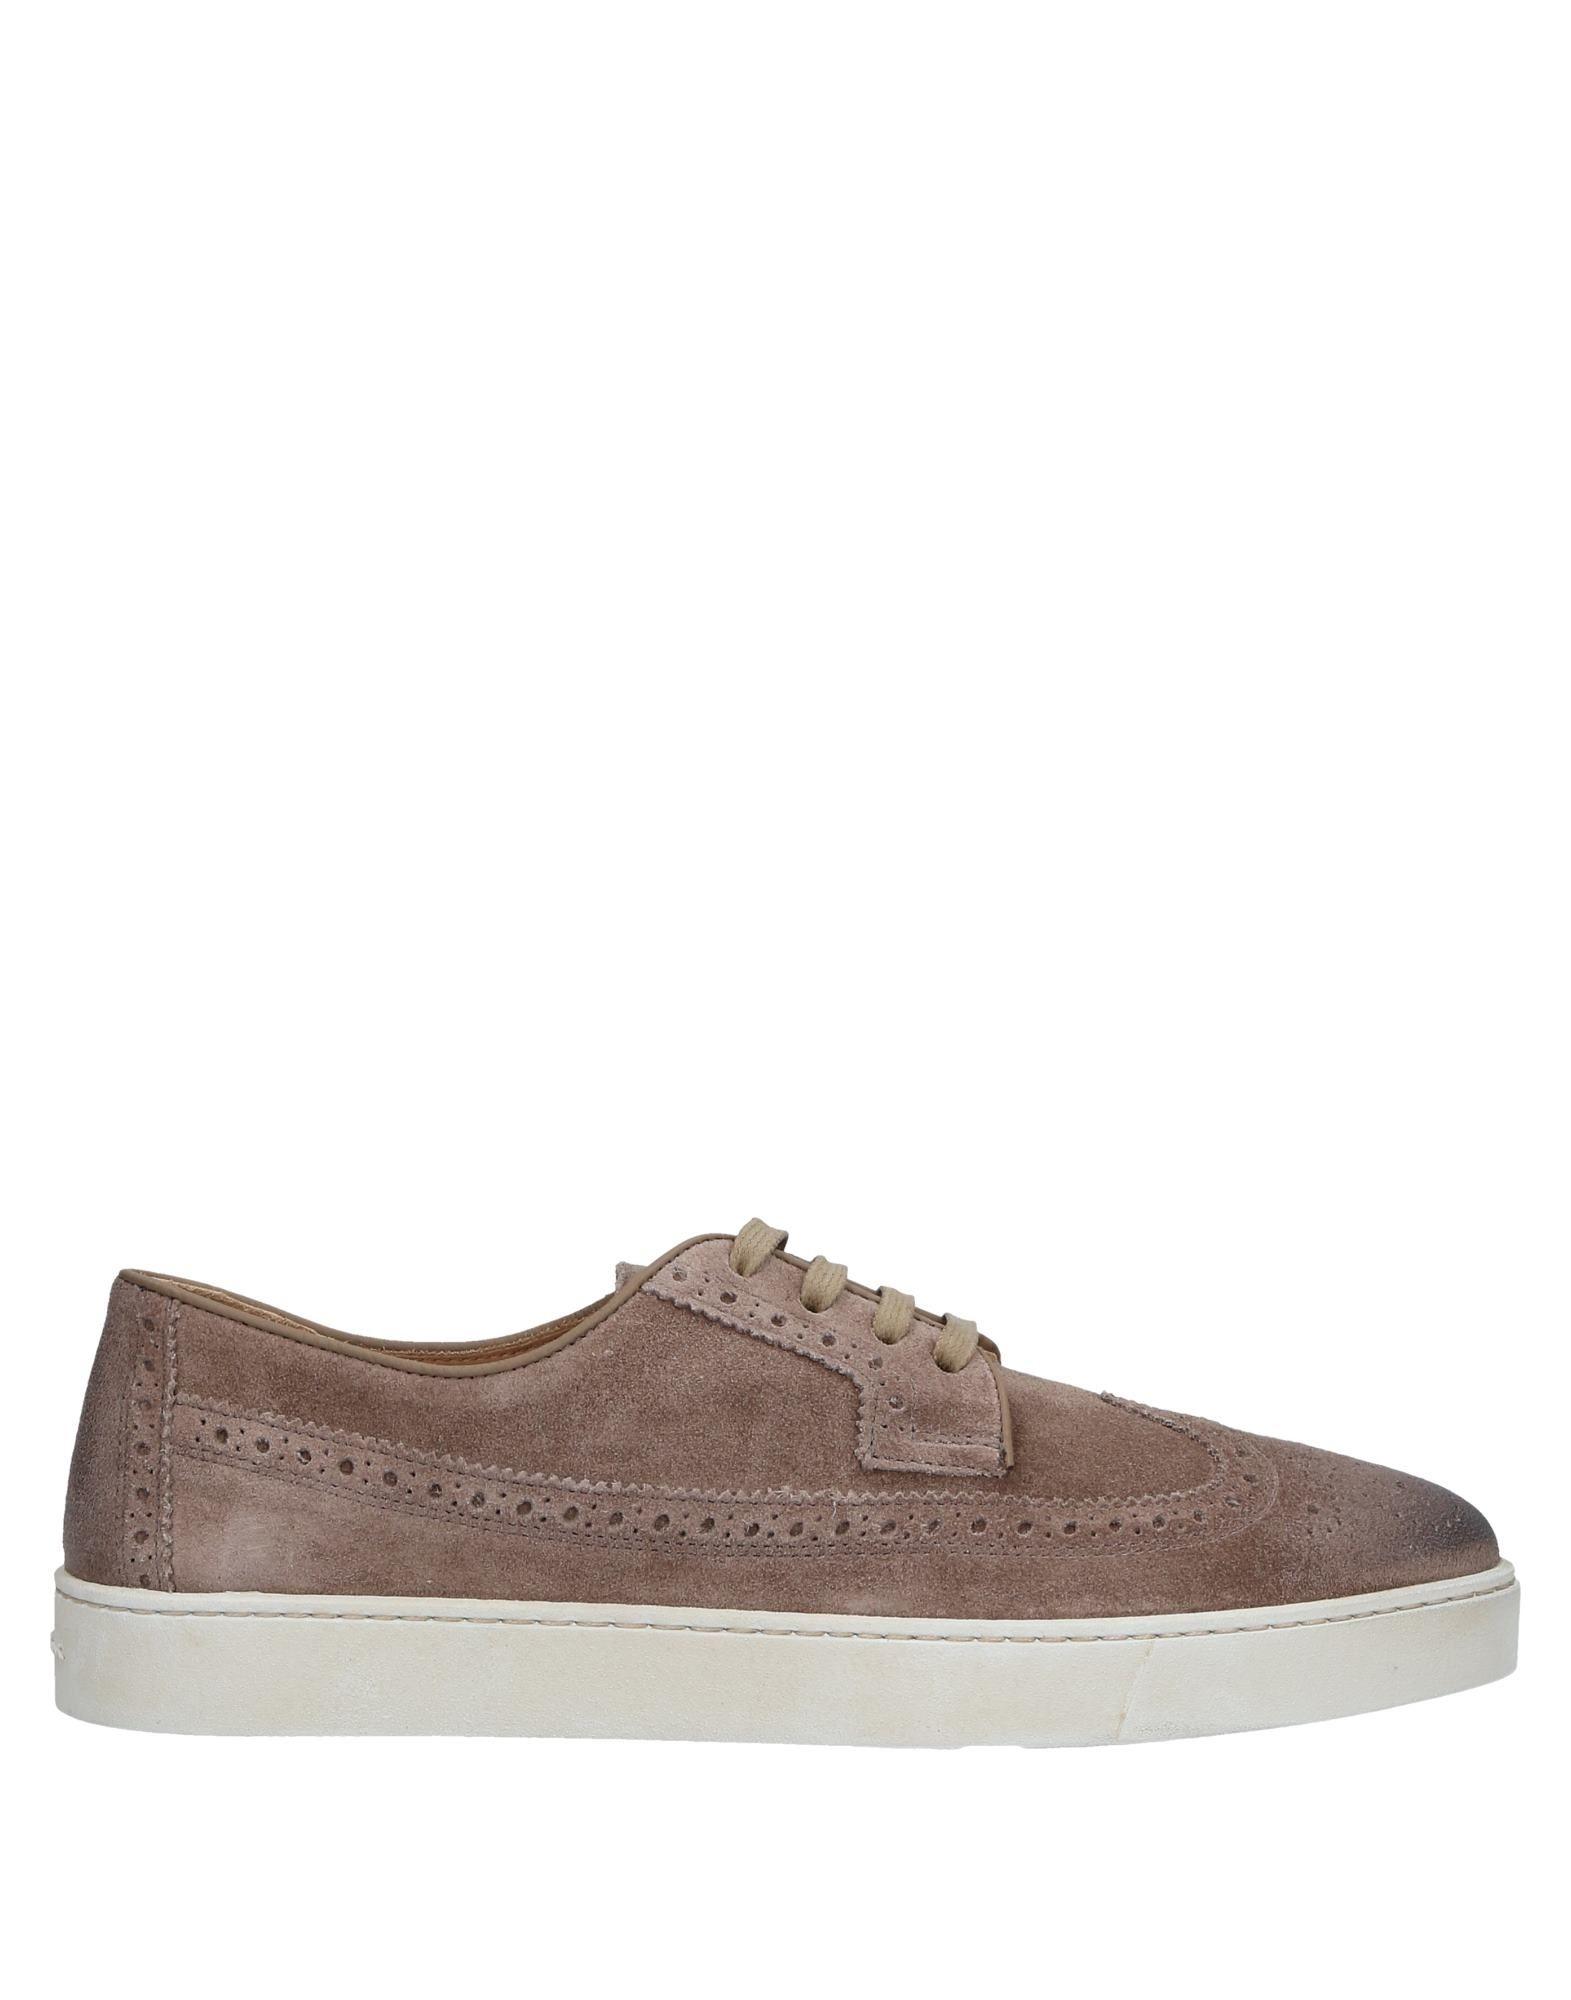 Günstige und modische Schuhe Santoni Sneakers Herren  11313536IN